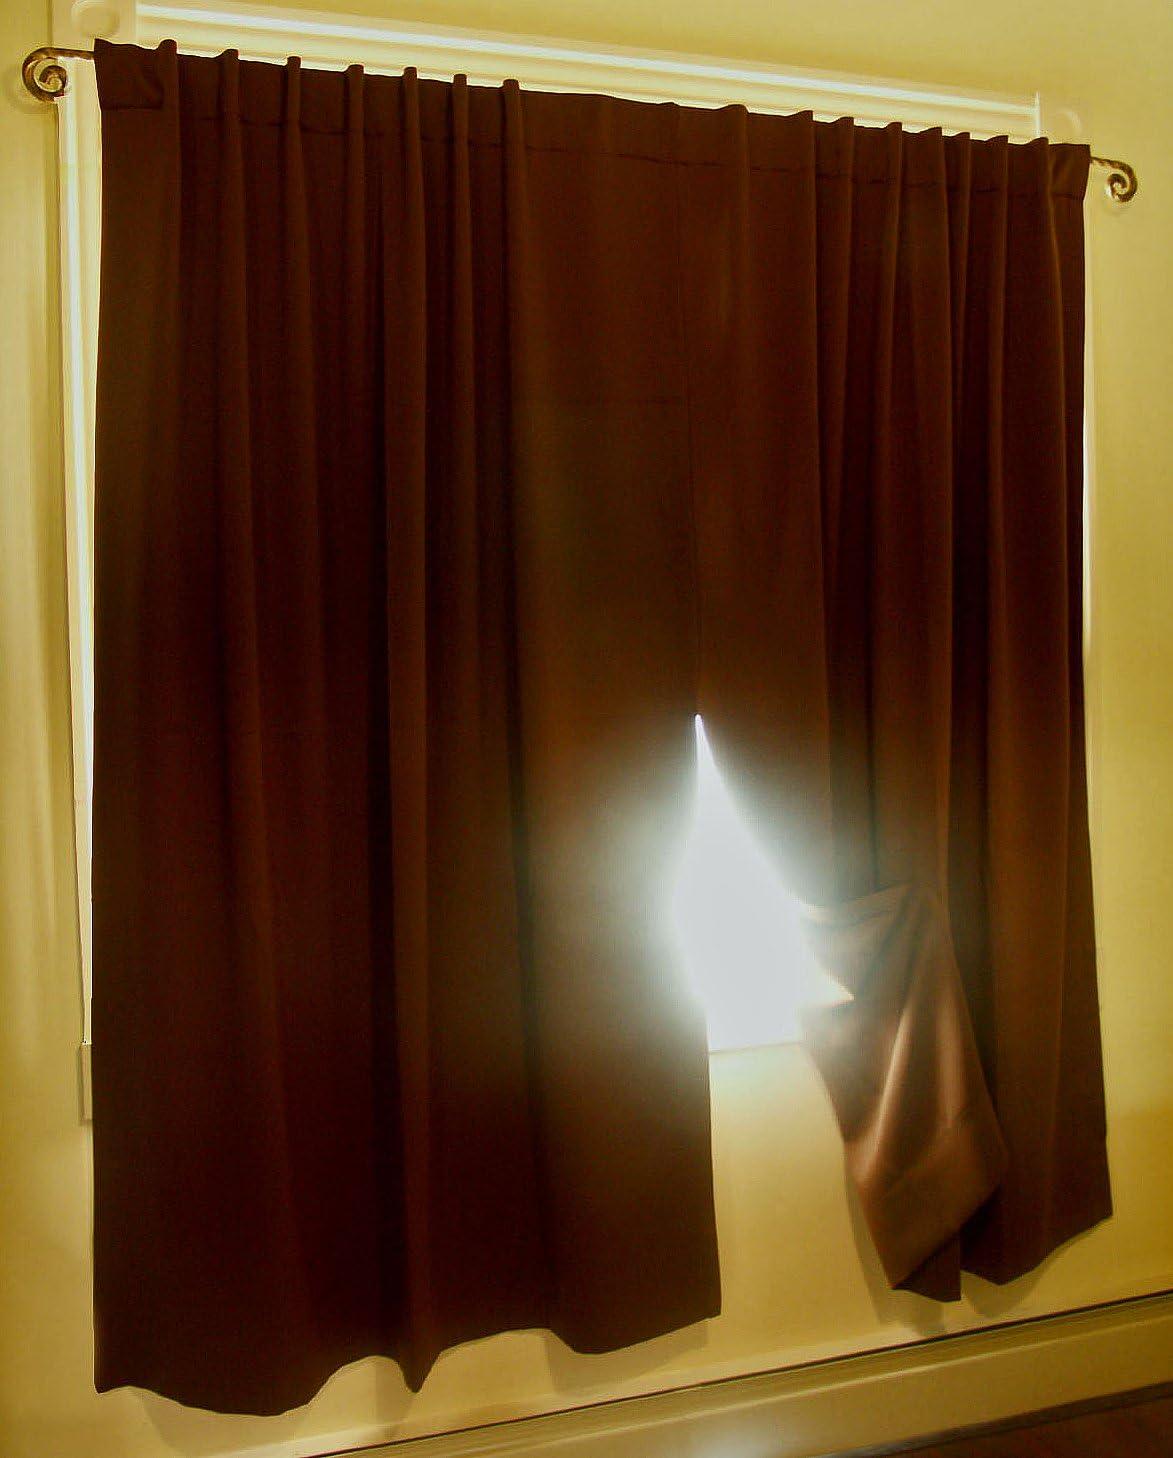 Ricardo Ultimate Blackout Curtain 贈答 送料無料/新品 Panel x Espresso 56